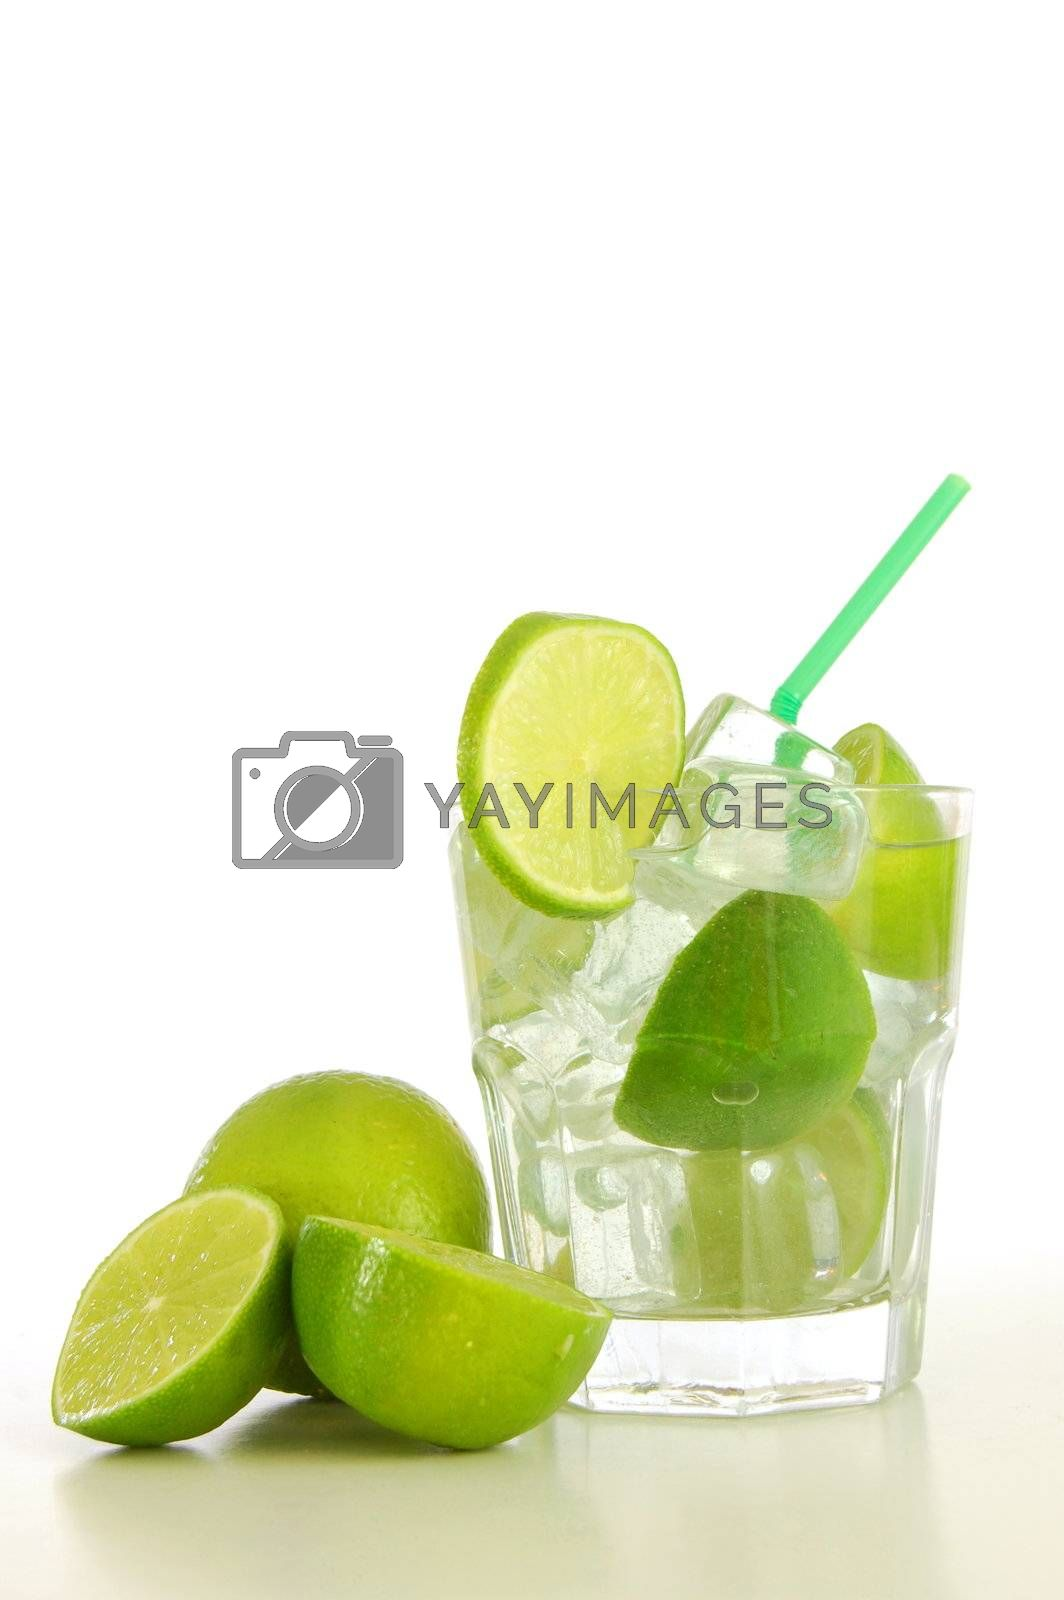 cocktail drink with lime like Caipirinha or mojito